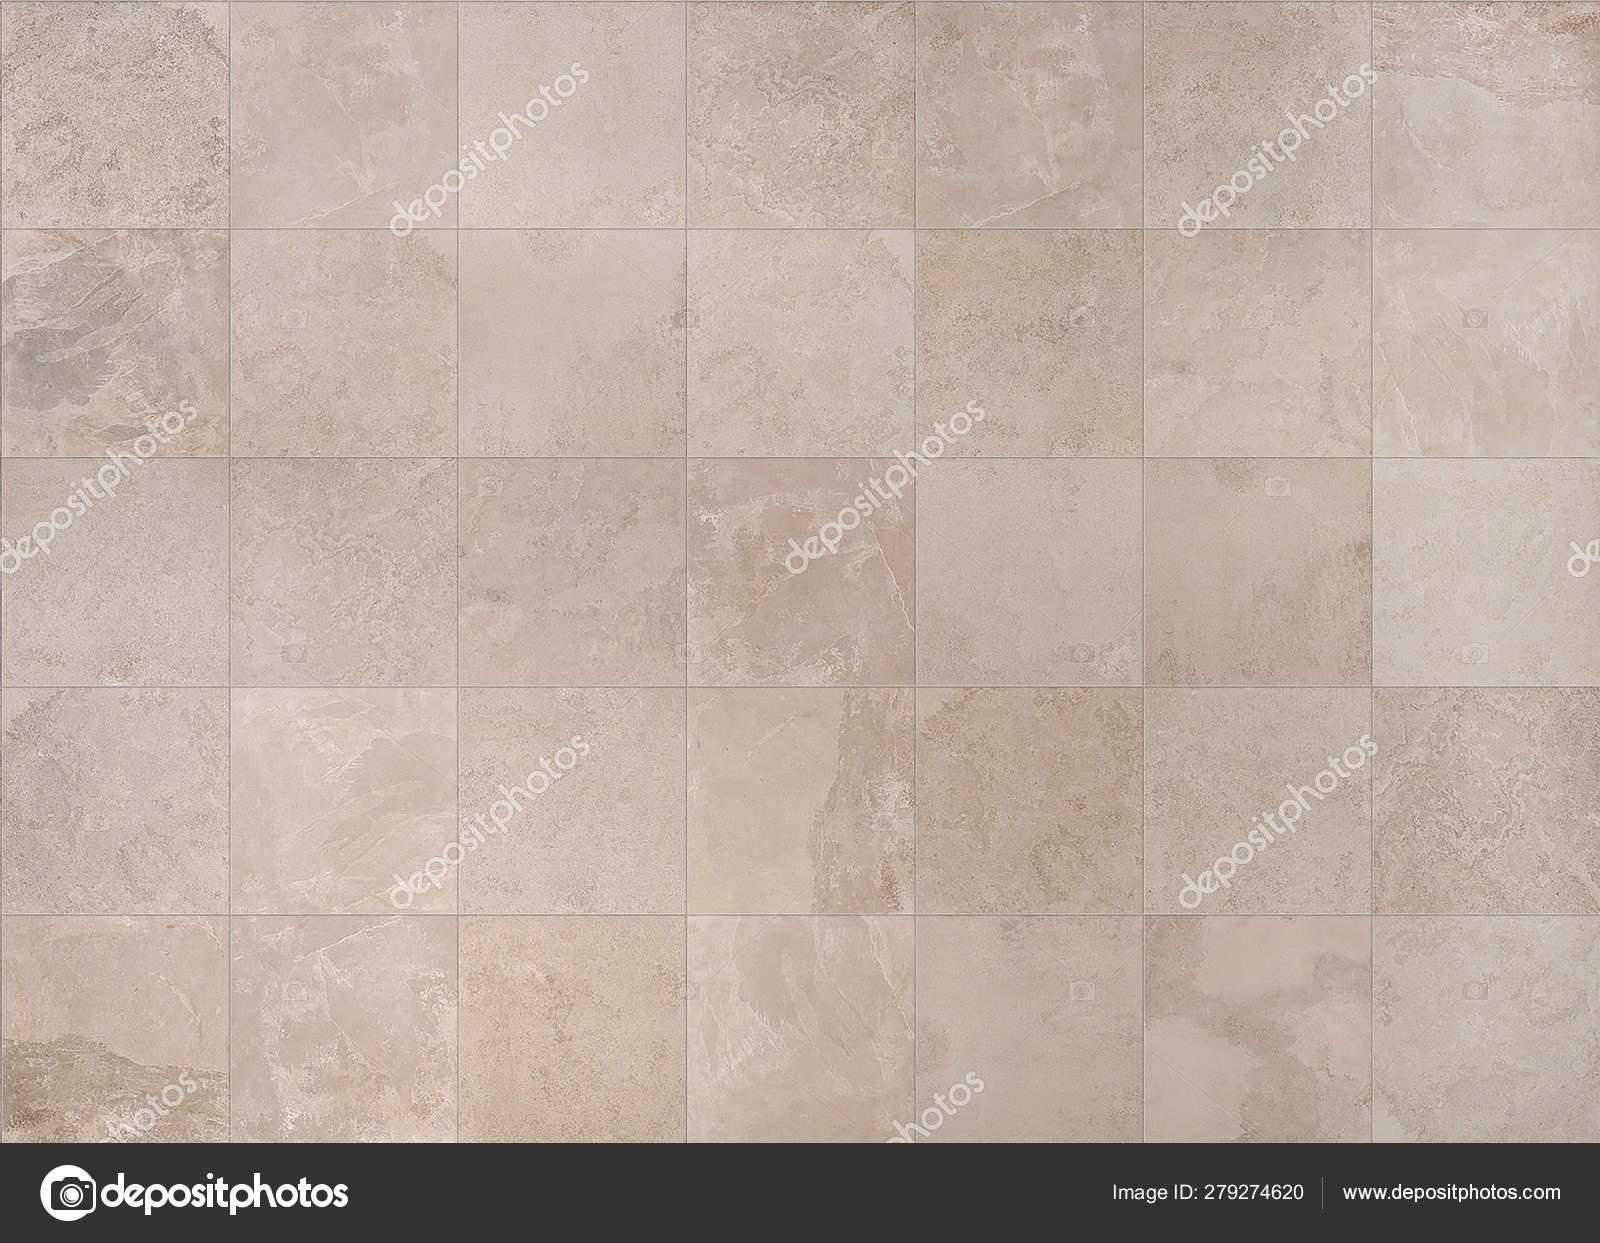 https depositphotos com 279274620 stock photo slate natural stone tile seamless html